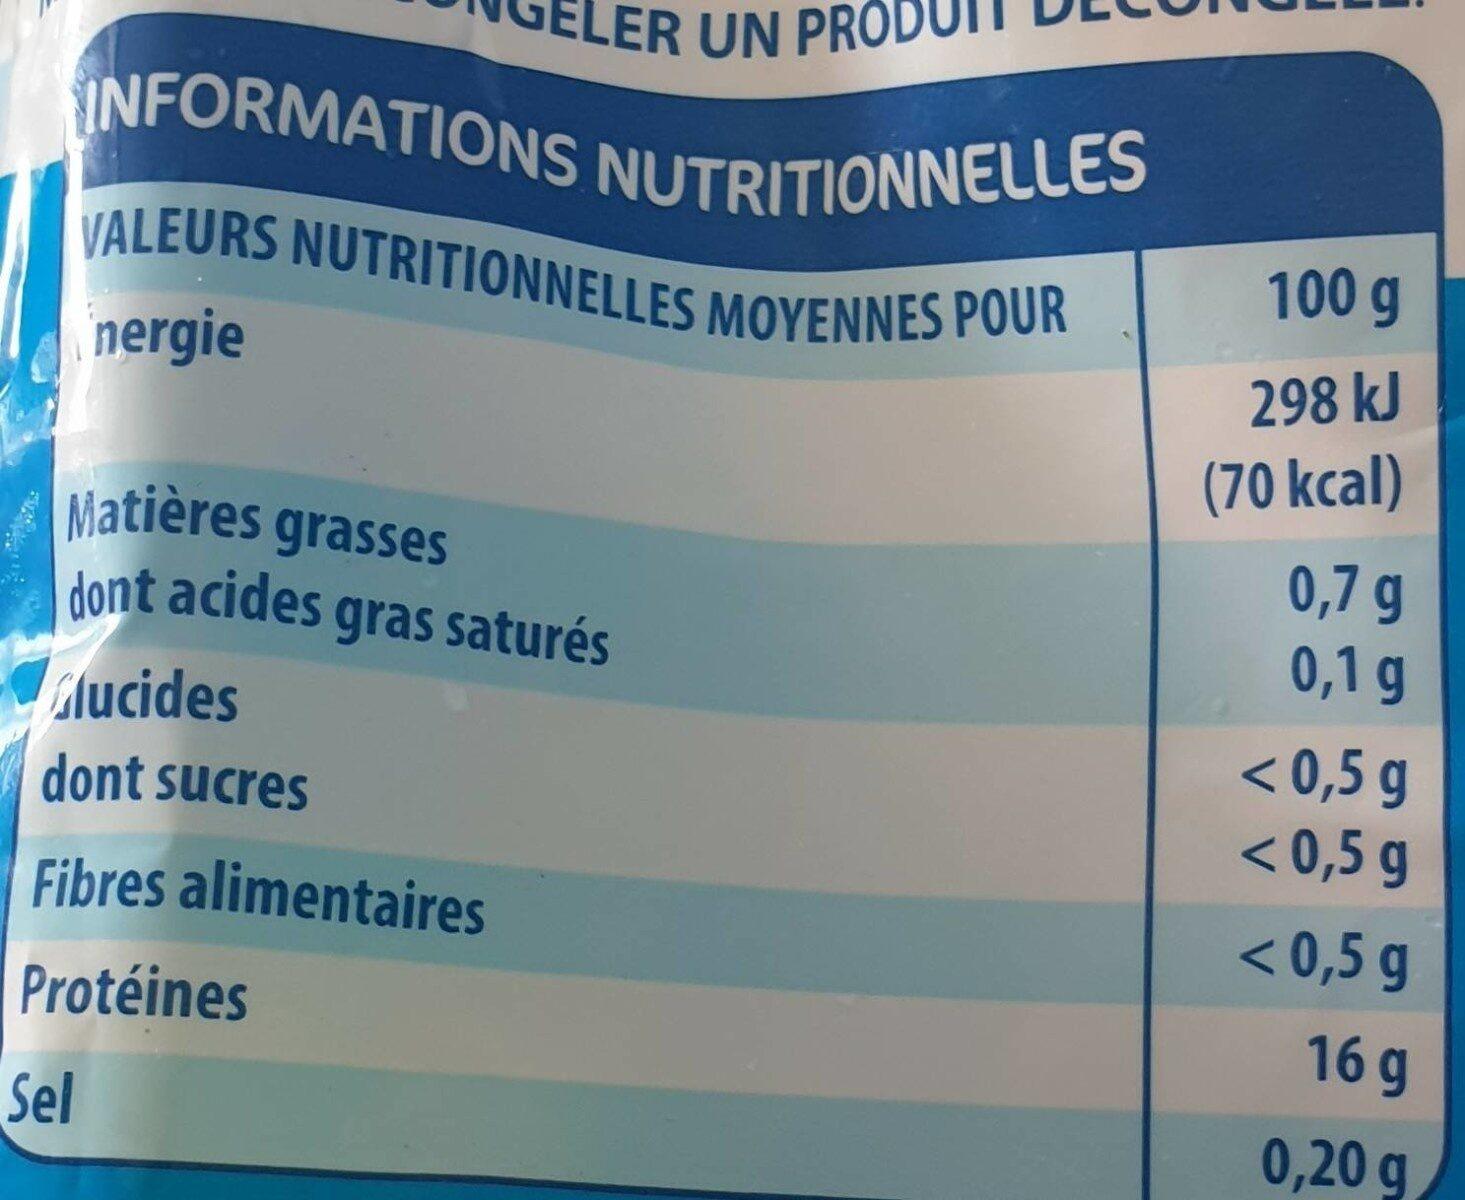 Filet de colin d'Alaska - Informations nutritionnelles - fr